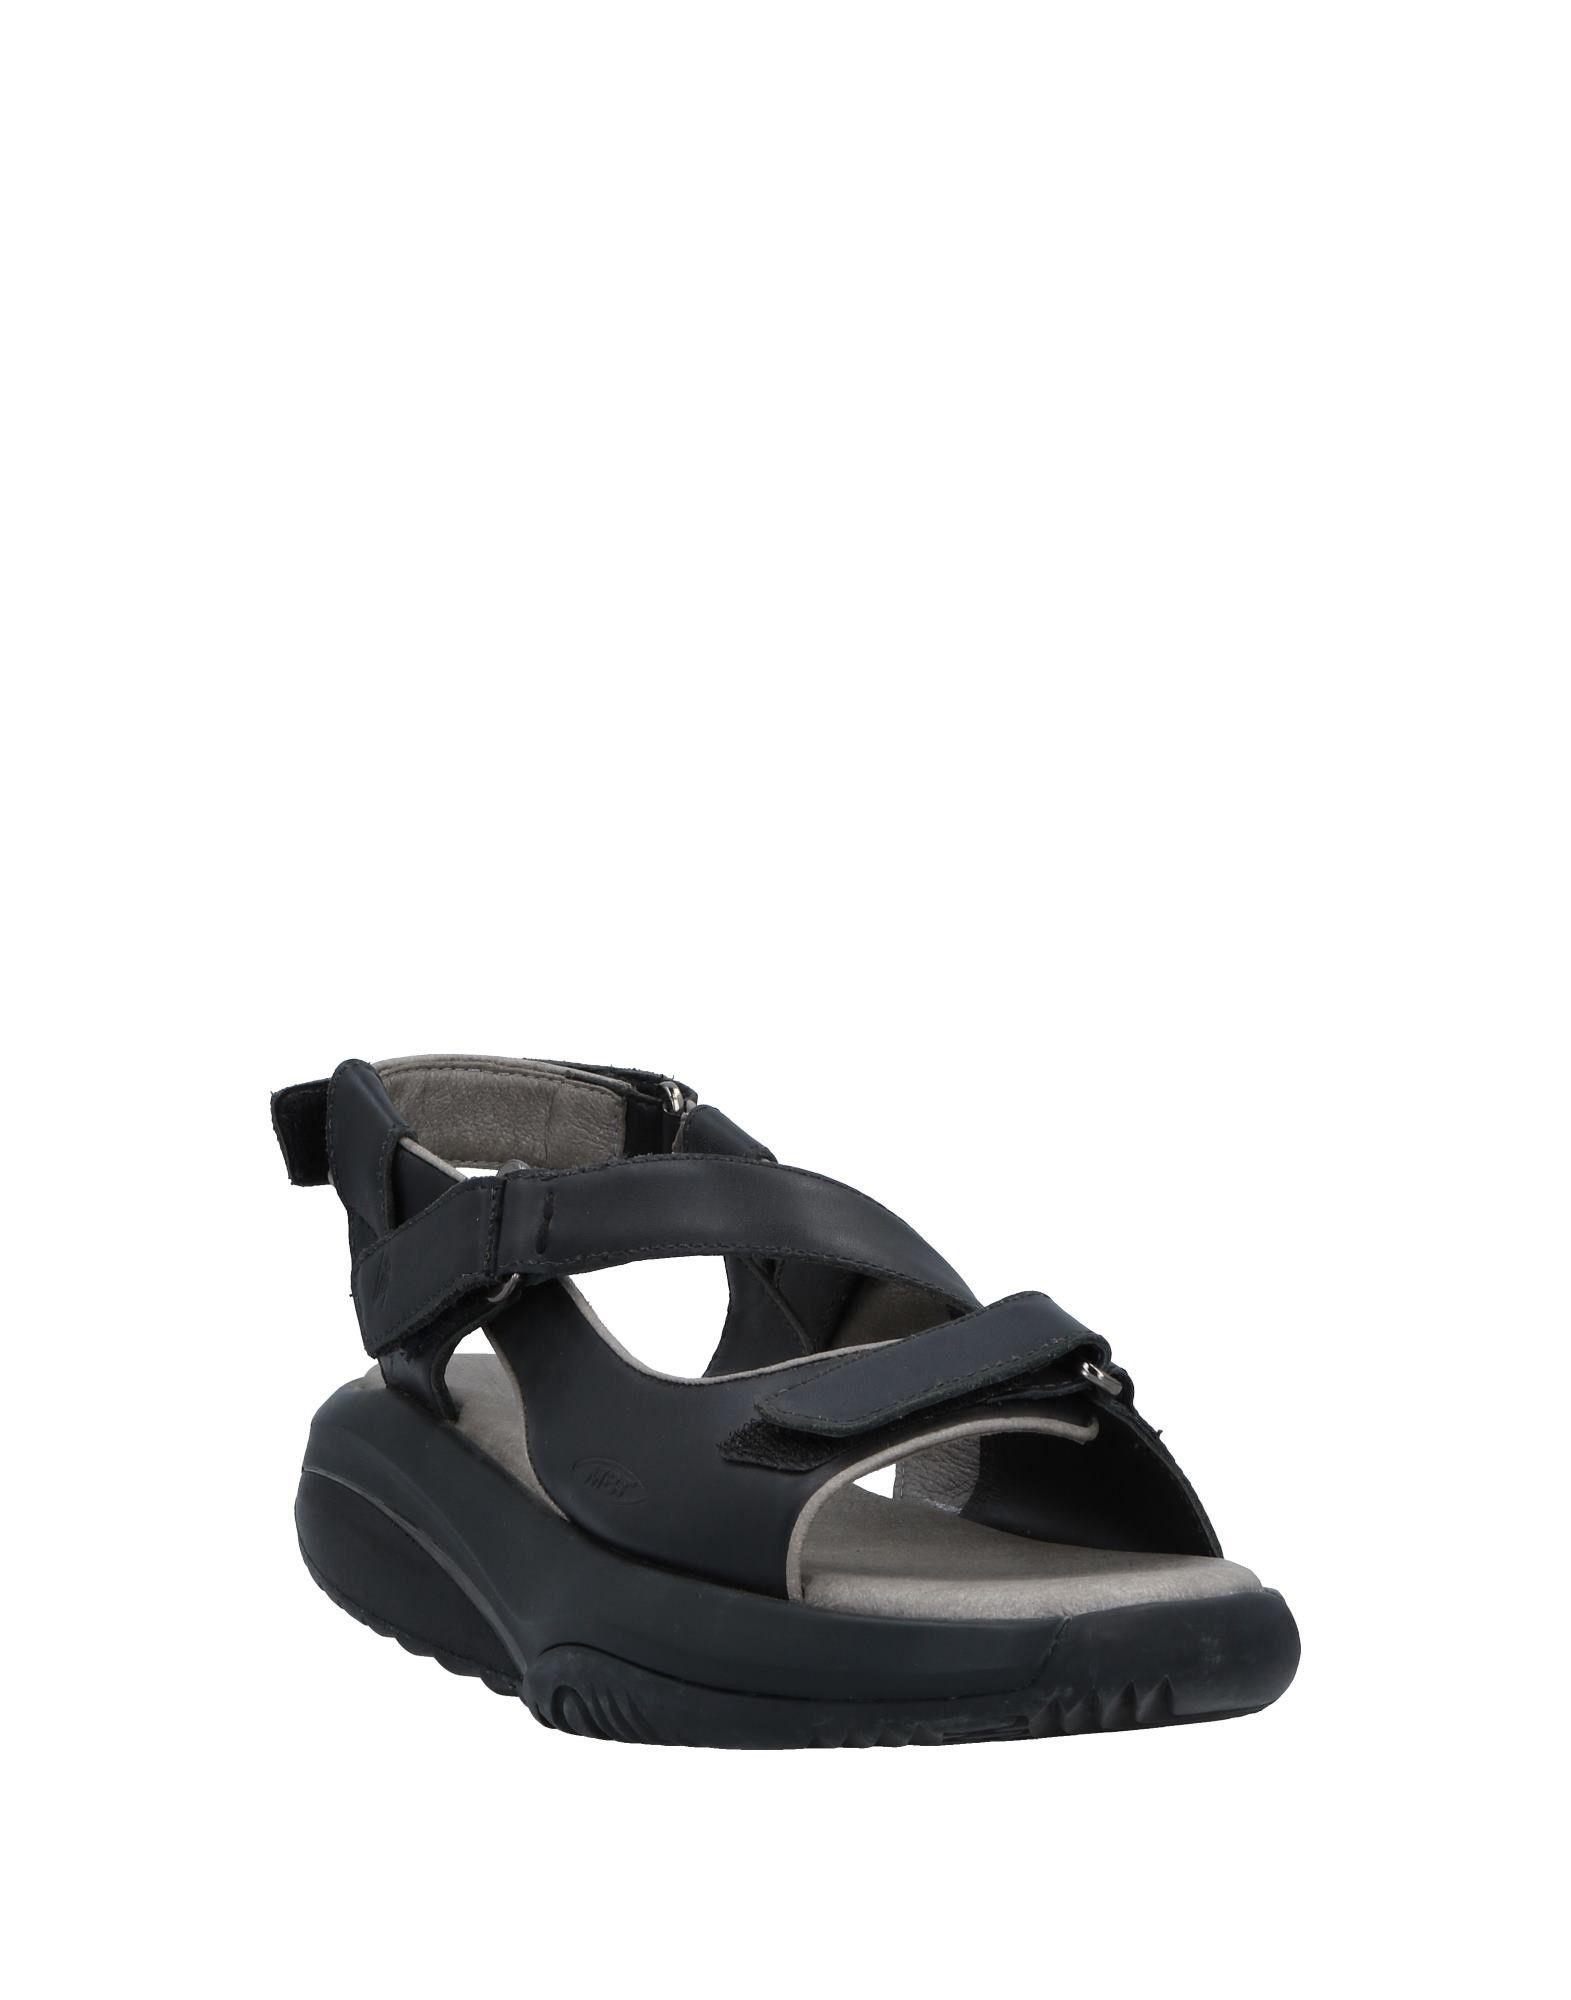 Stilvolle billige Schuhe Mbt Sandalen Damen  11529468DC 11529468DC 11529468DC 1b4095